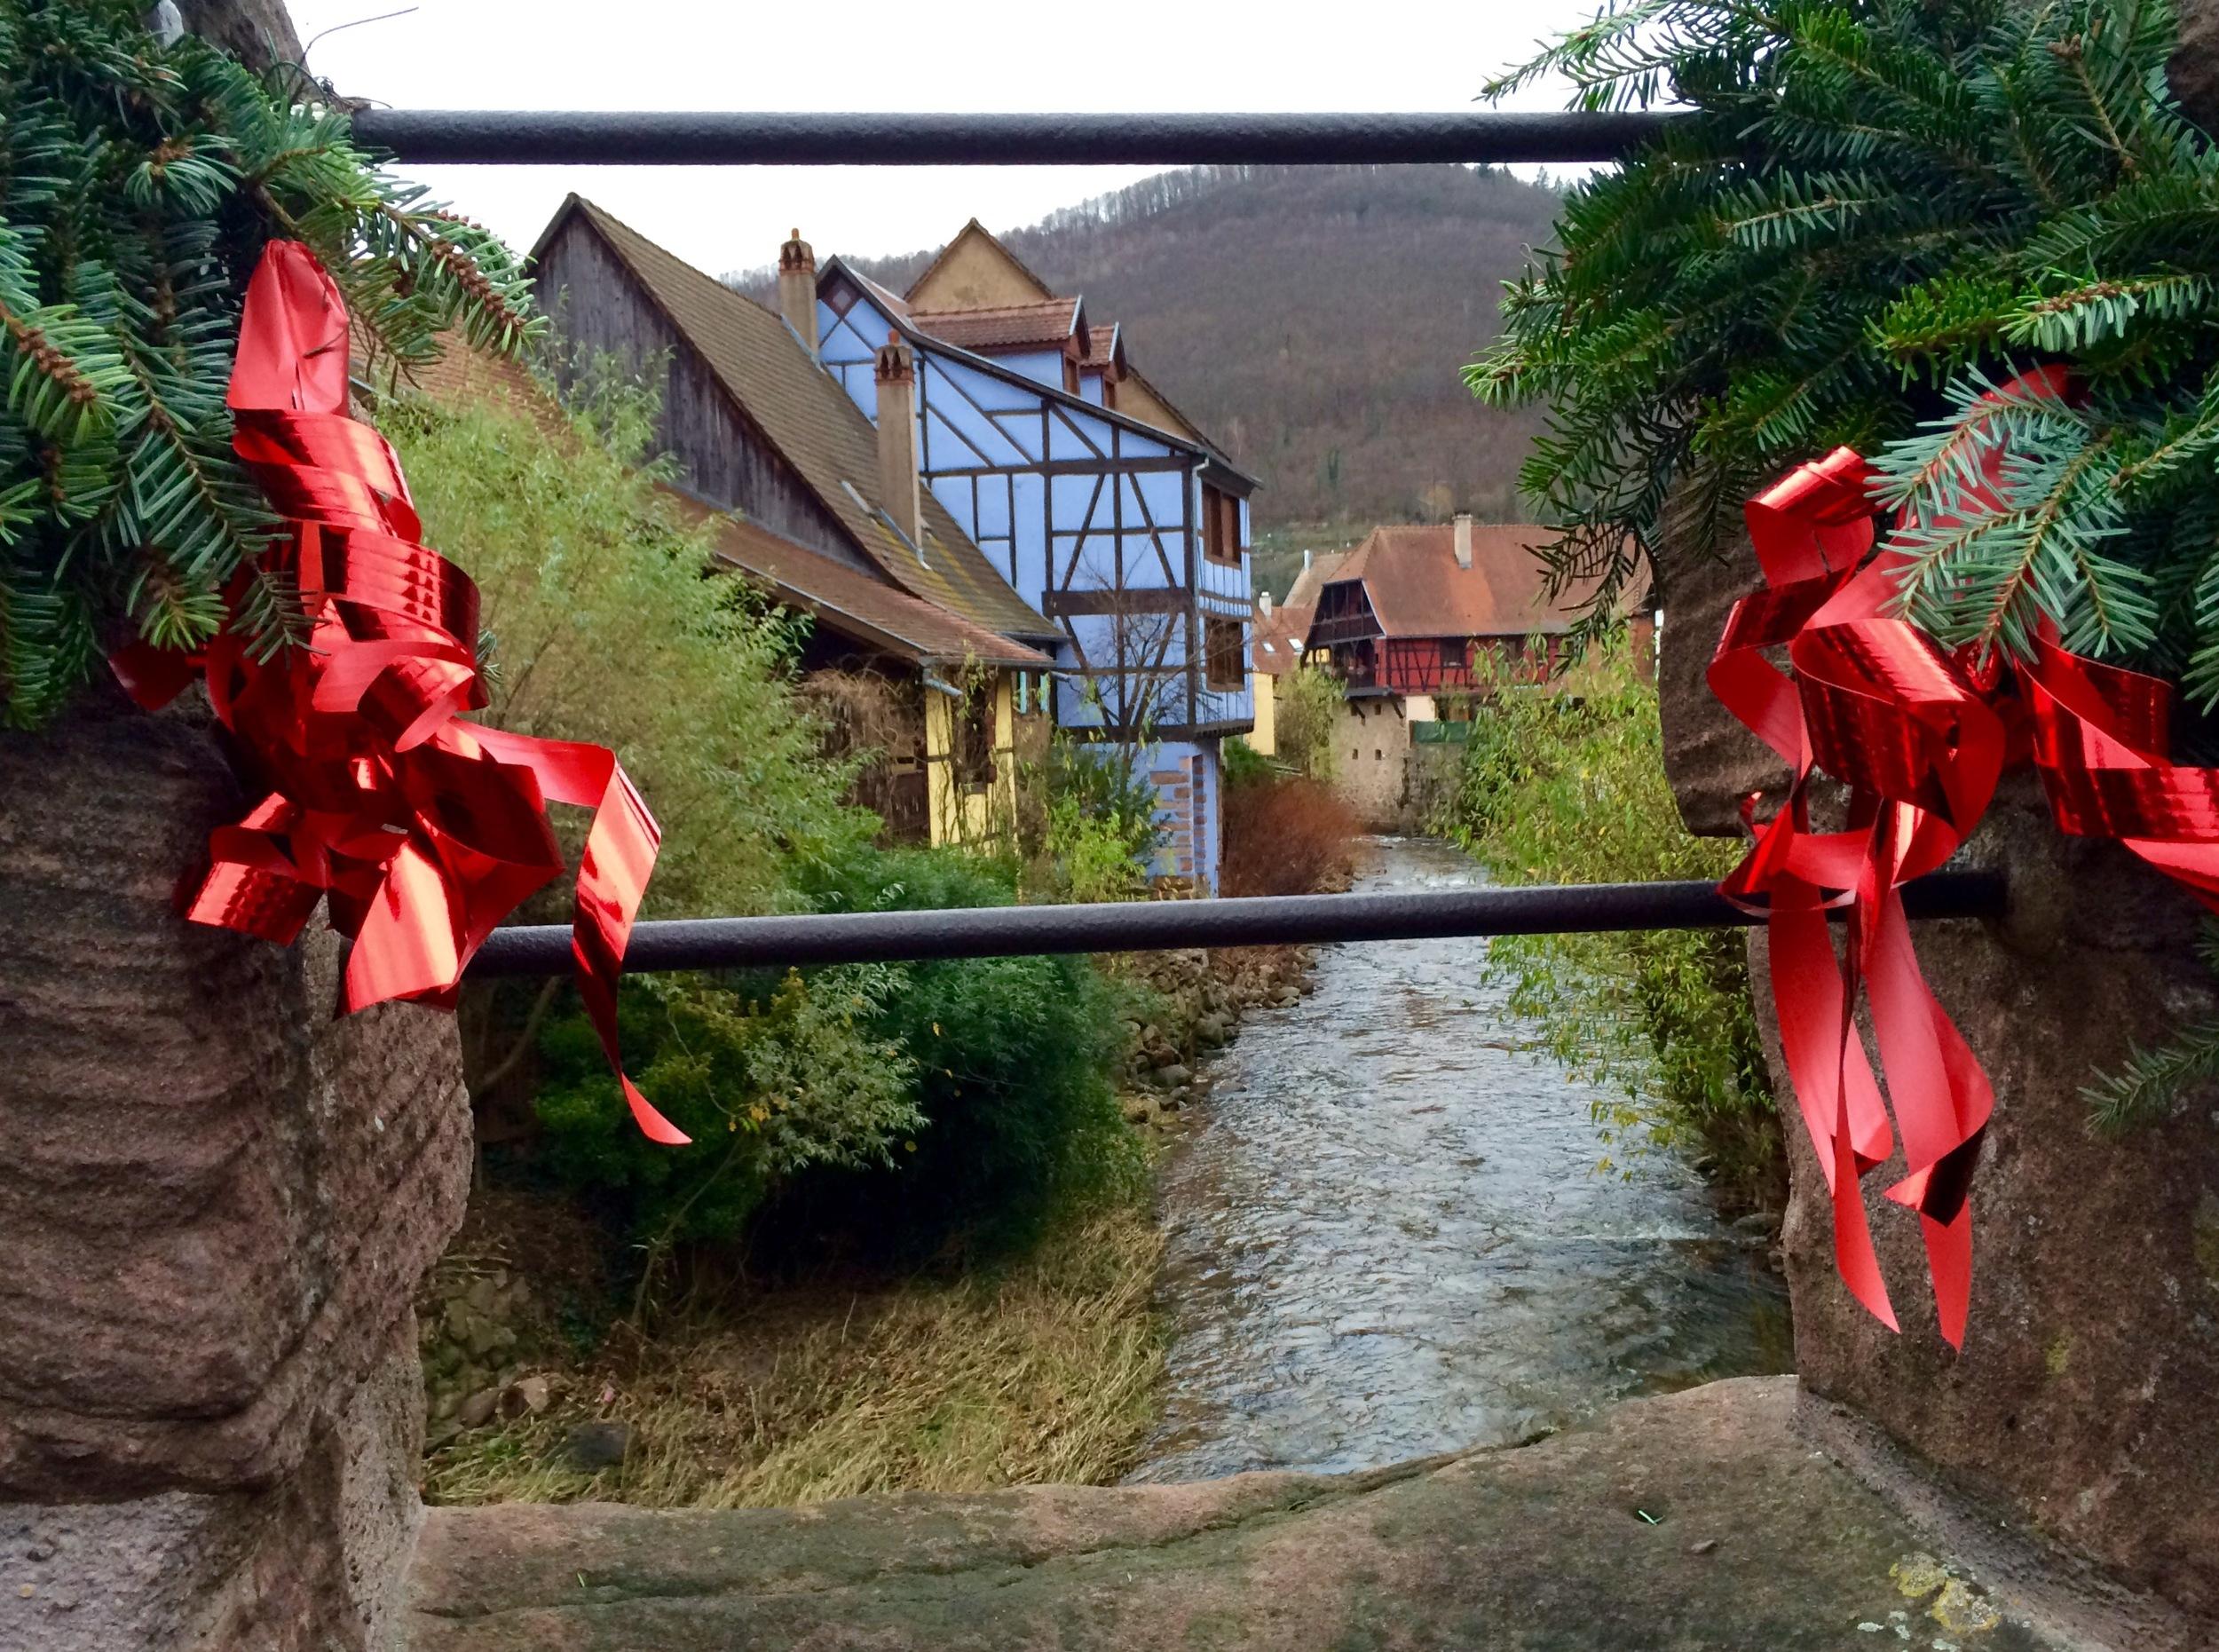 Christmasy 16th Century Bridge in Colmar